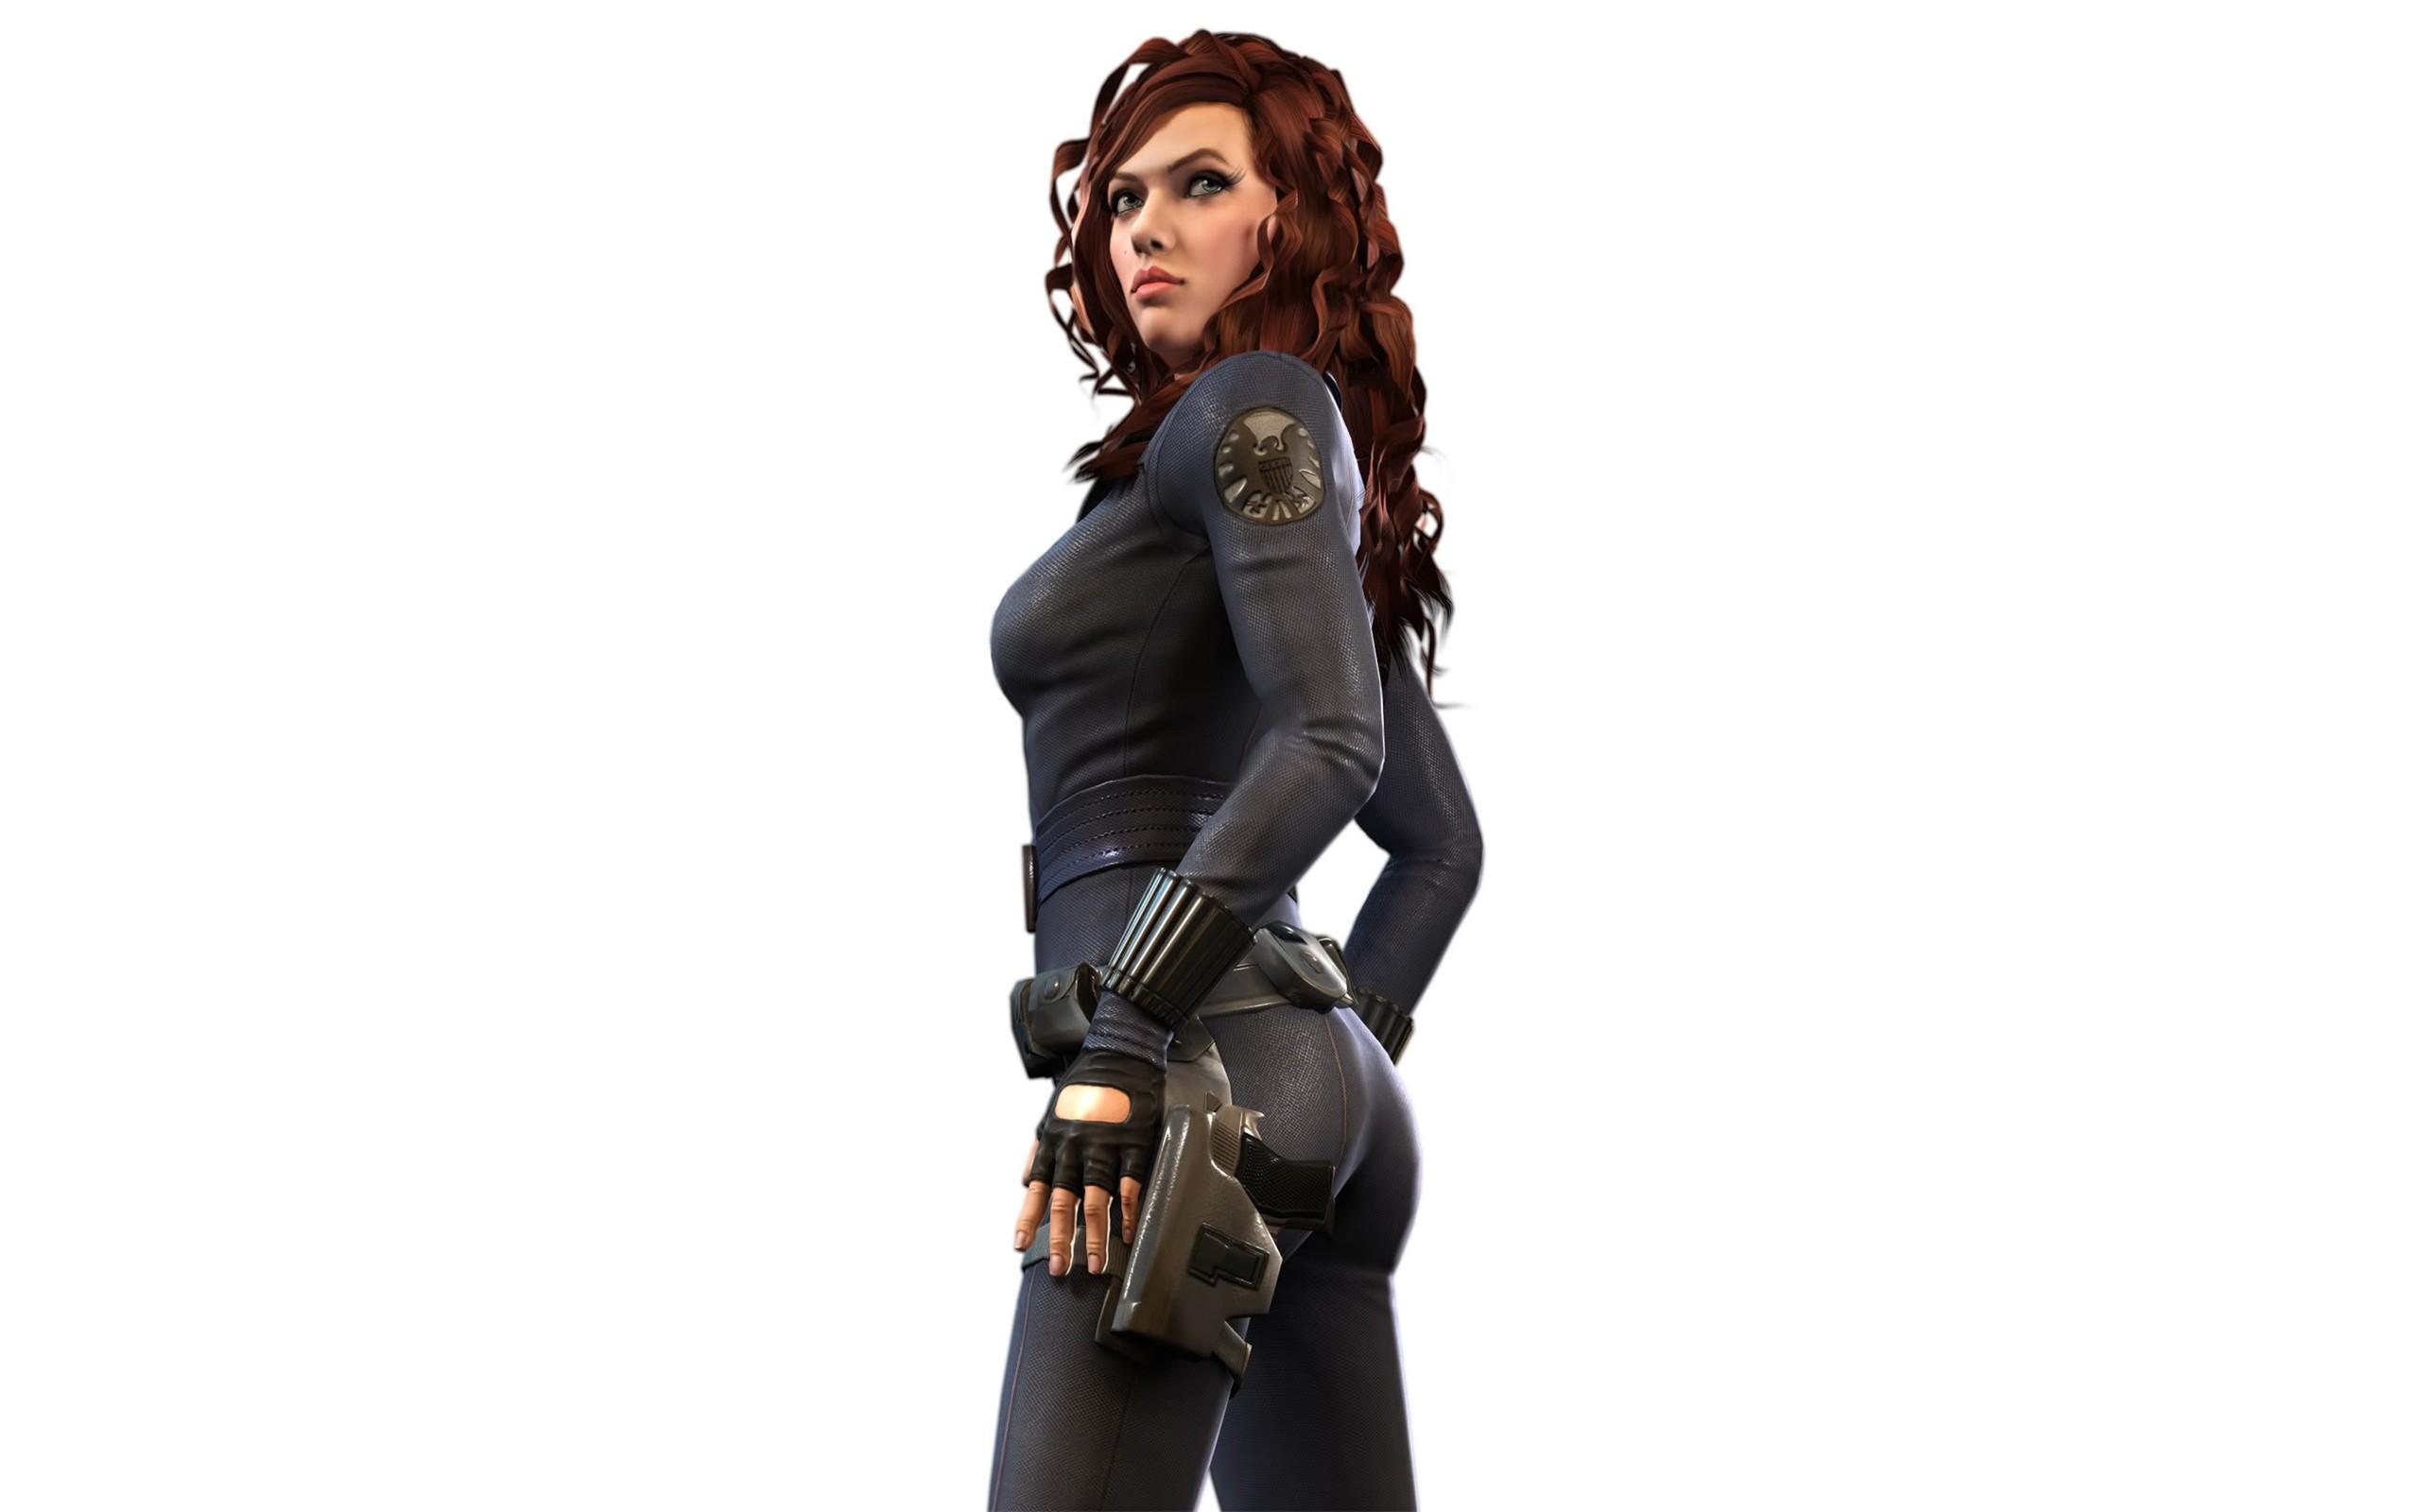 People 2560x1600 Black Widow Scarlett Johansson Iron Man 2 Marvel Comics The Avengers